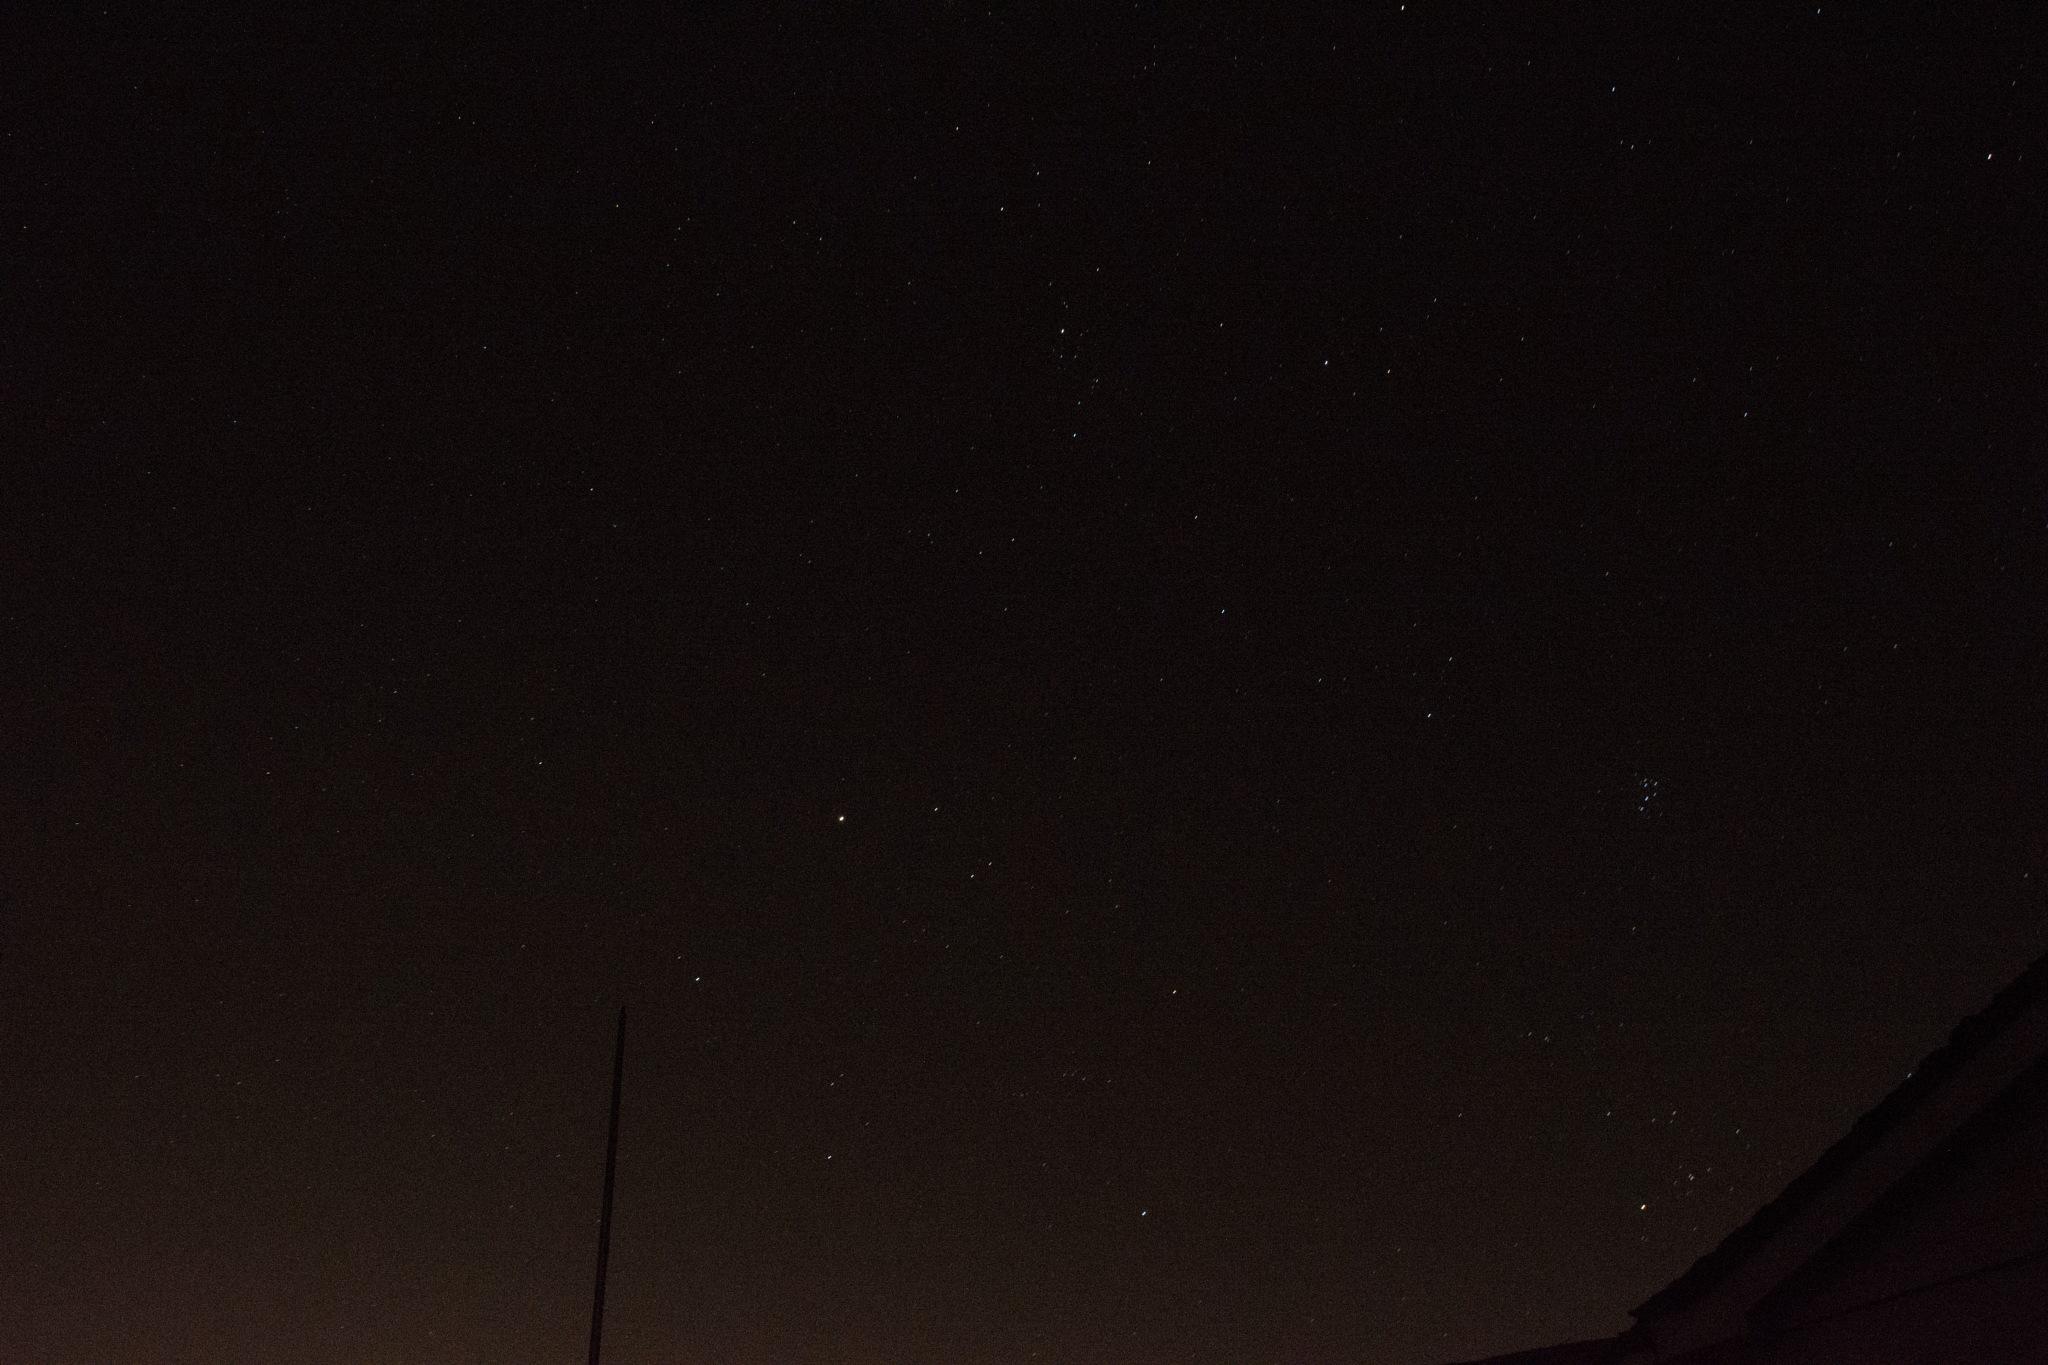 Night over Dovestones 3 by ianjck